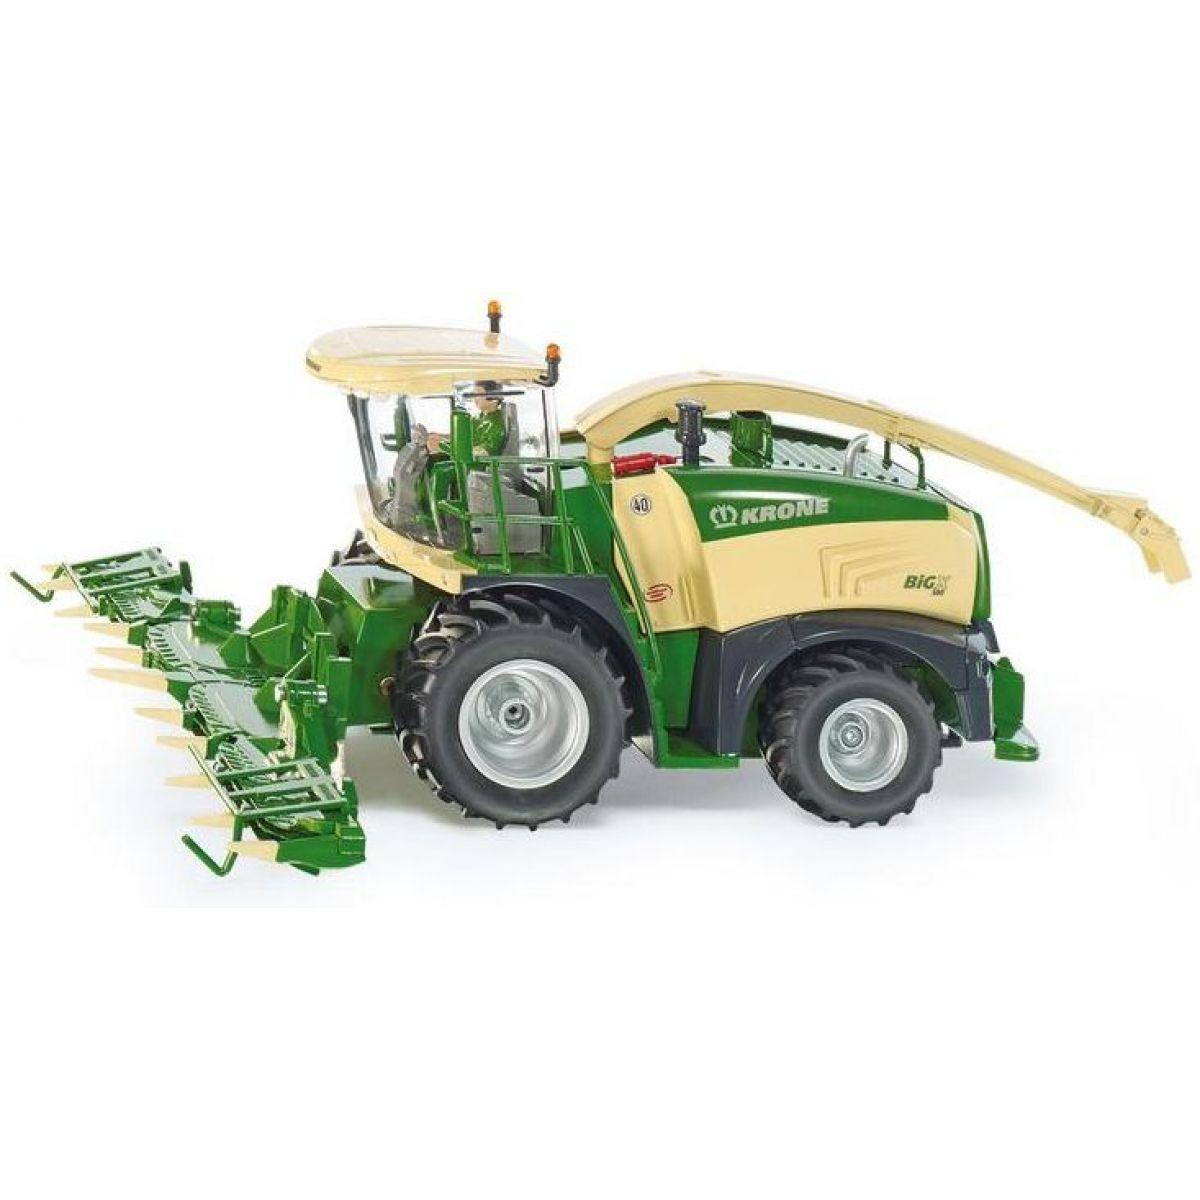 Řezačka kukuřice Krone BIG X 580 SIKU 1:32 SIKU